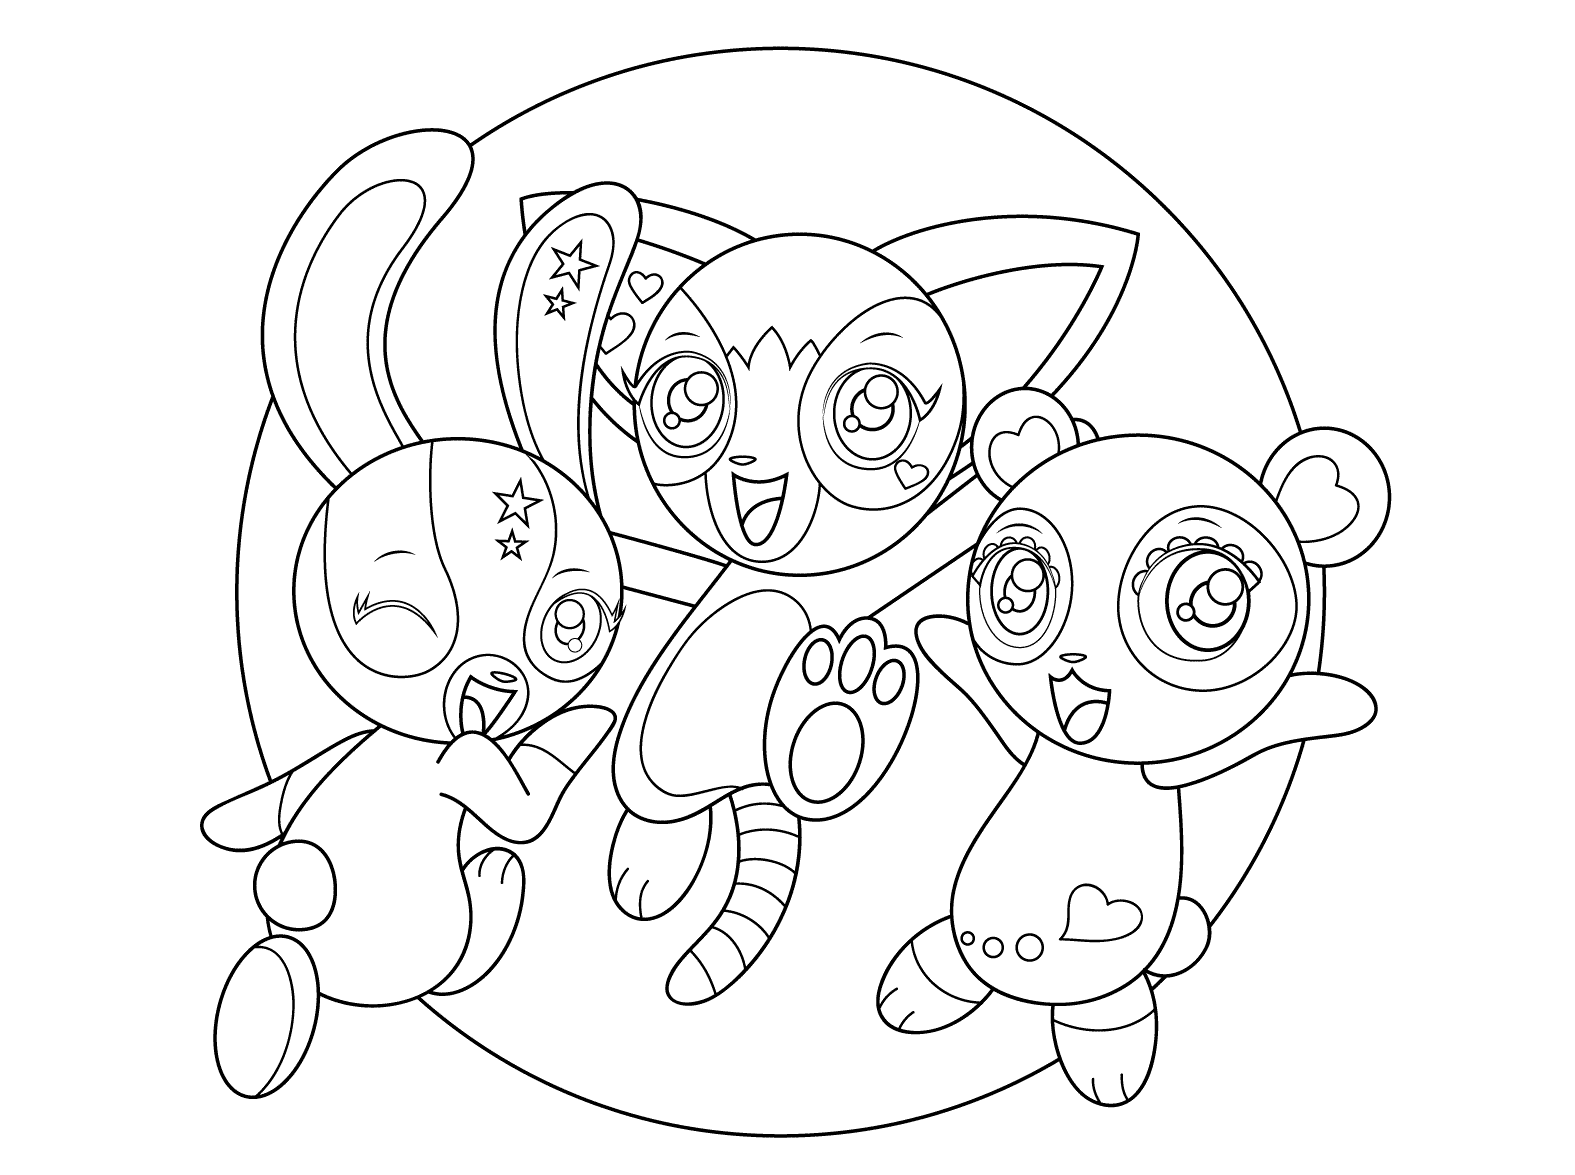 Desenho De Yoohoo Mangá Para Colorir